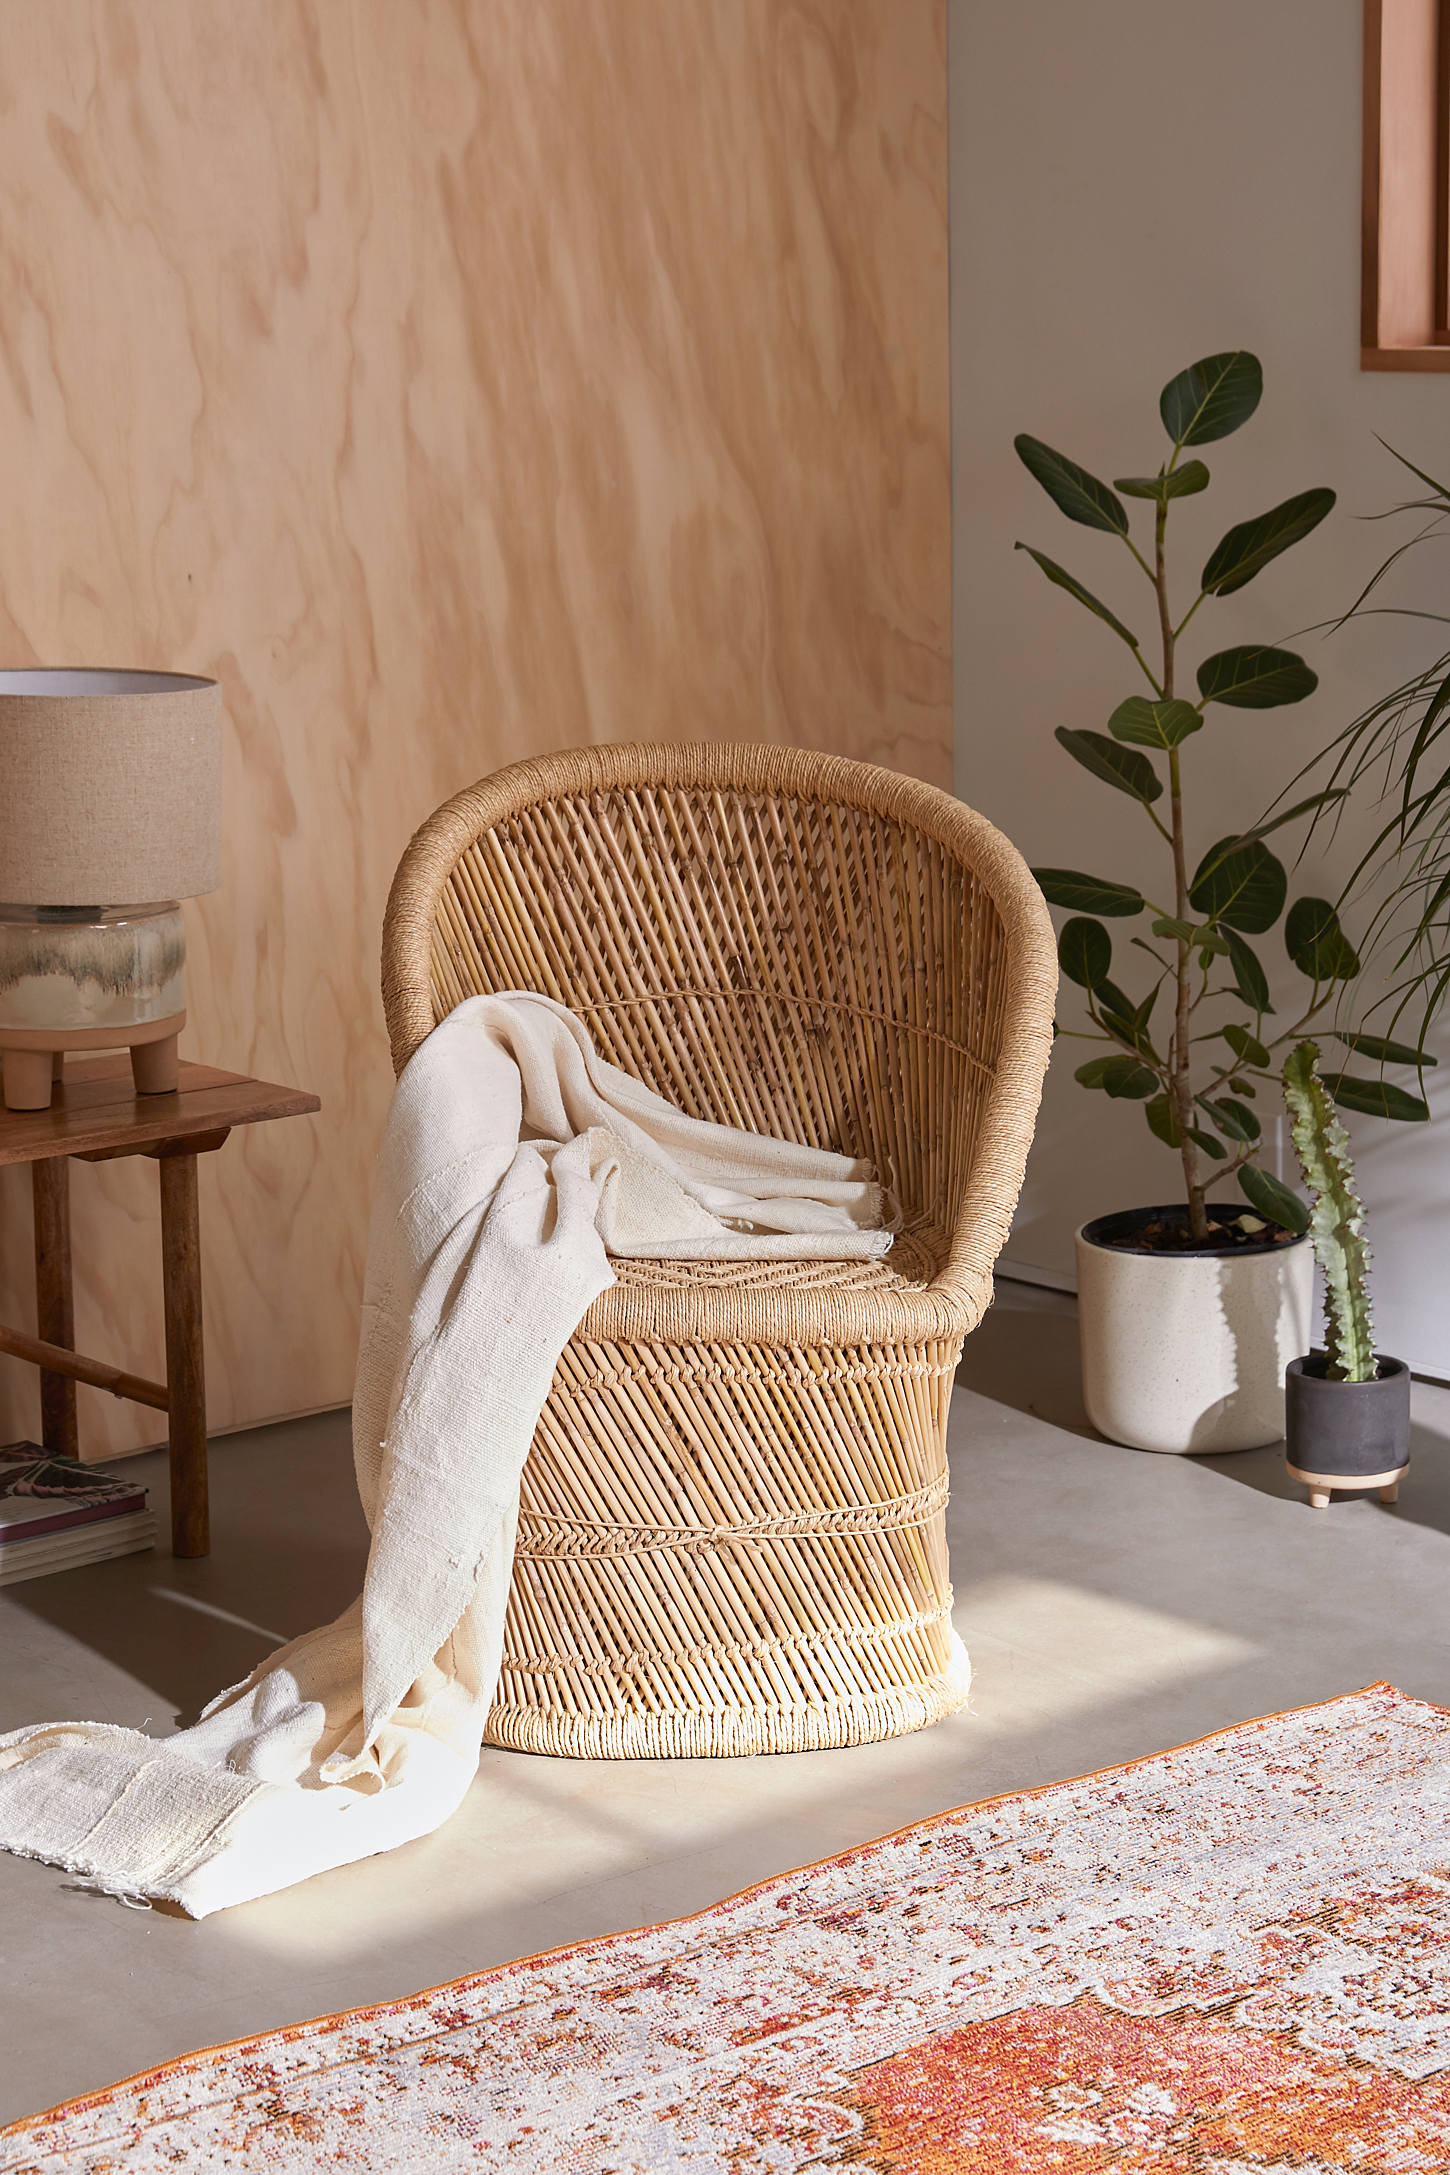 Excellent Willow Wicker Chair Lamtechconsult Wood Chair Design Ideas Lamtechconsultcom